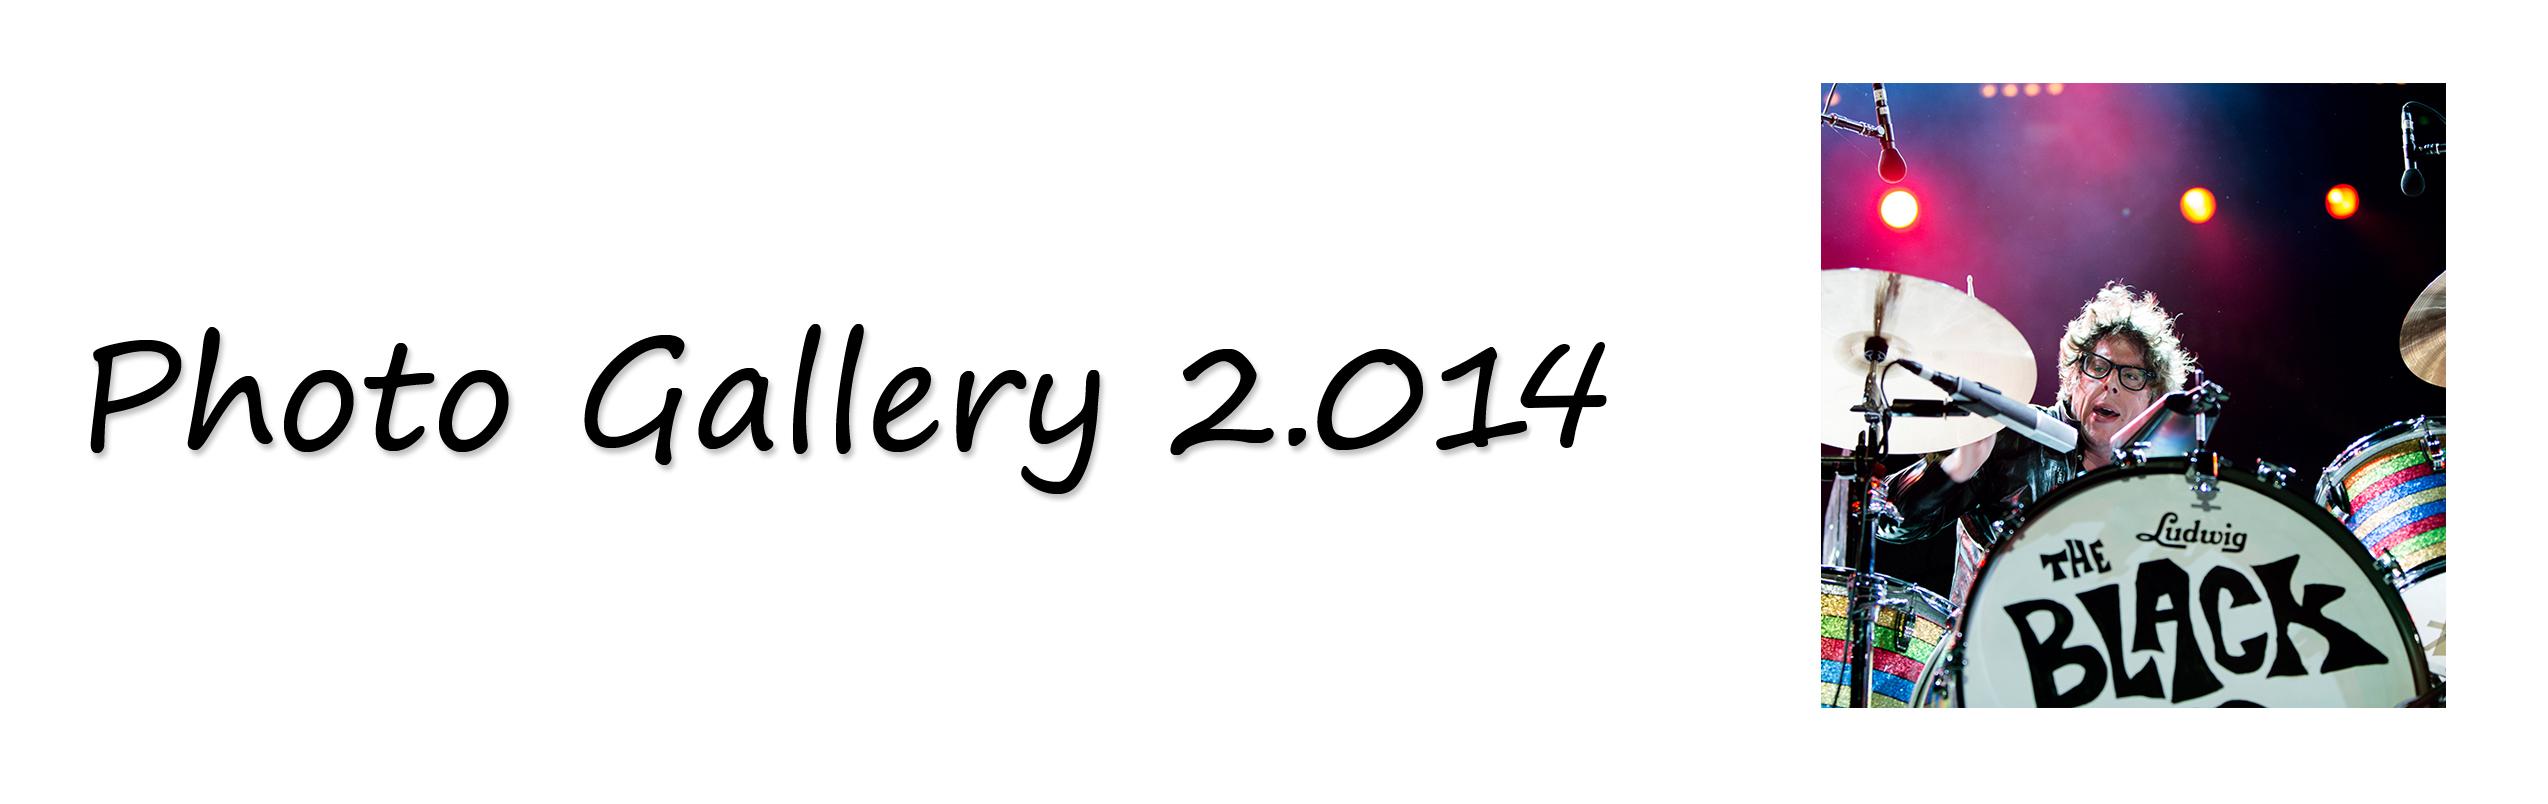 Photo Gallery 2014